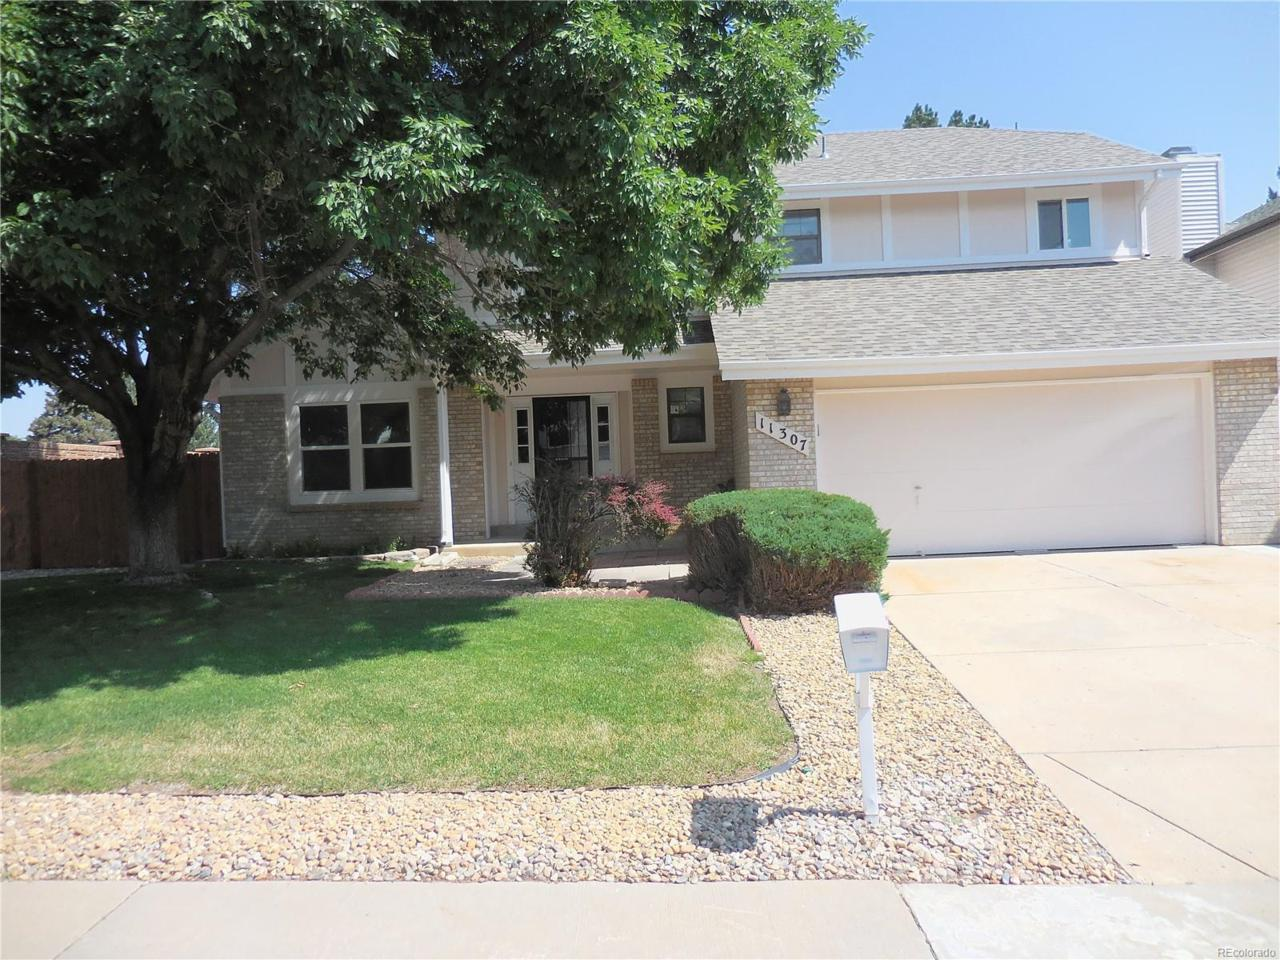 11307 E Evans Avenue, Aurora, CO 80014 (MLS #9008022) :: 8z Real Estate